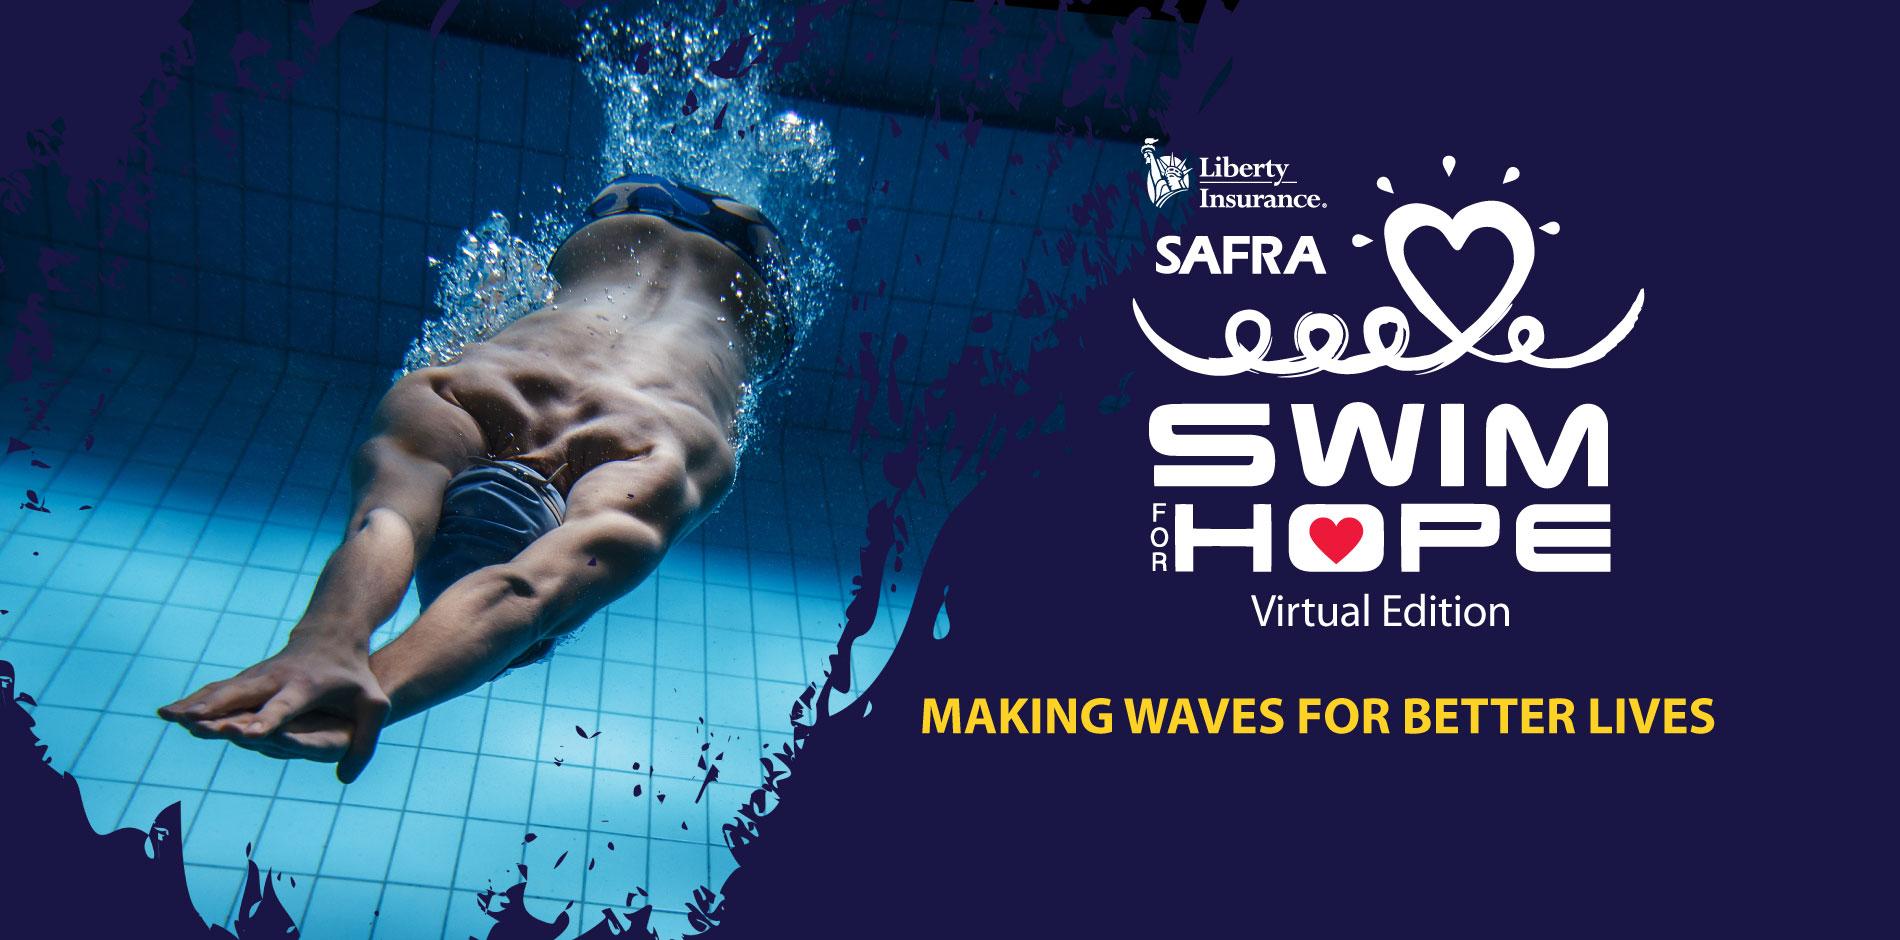 Swim-for-Hope-2020_web1900x940-px_1 (1)